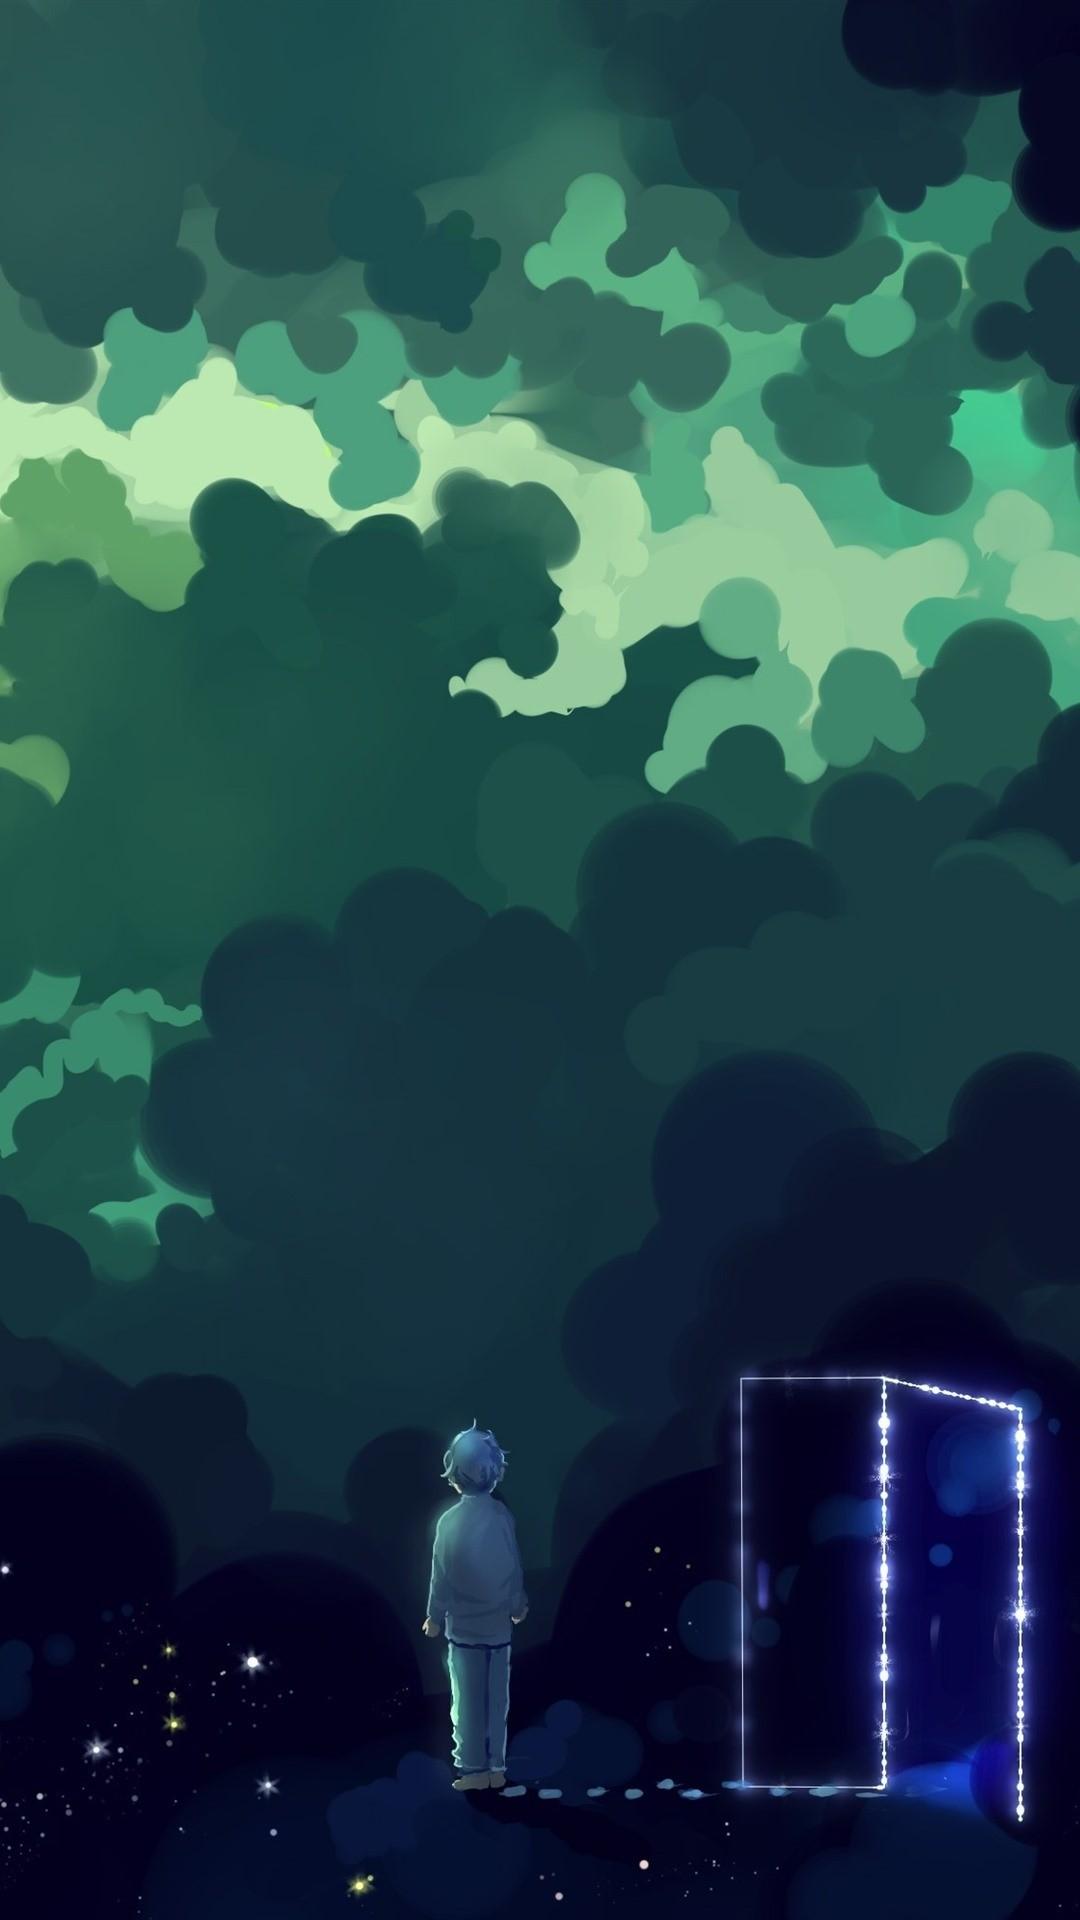 Magic phone background